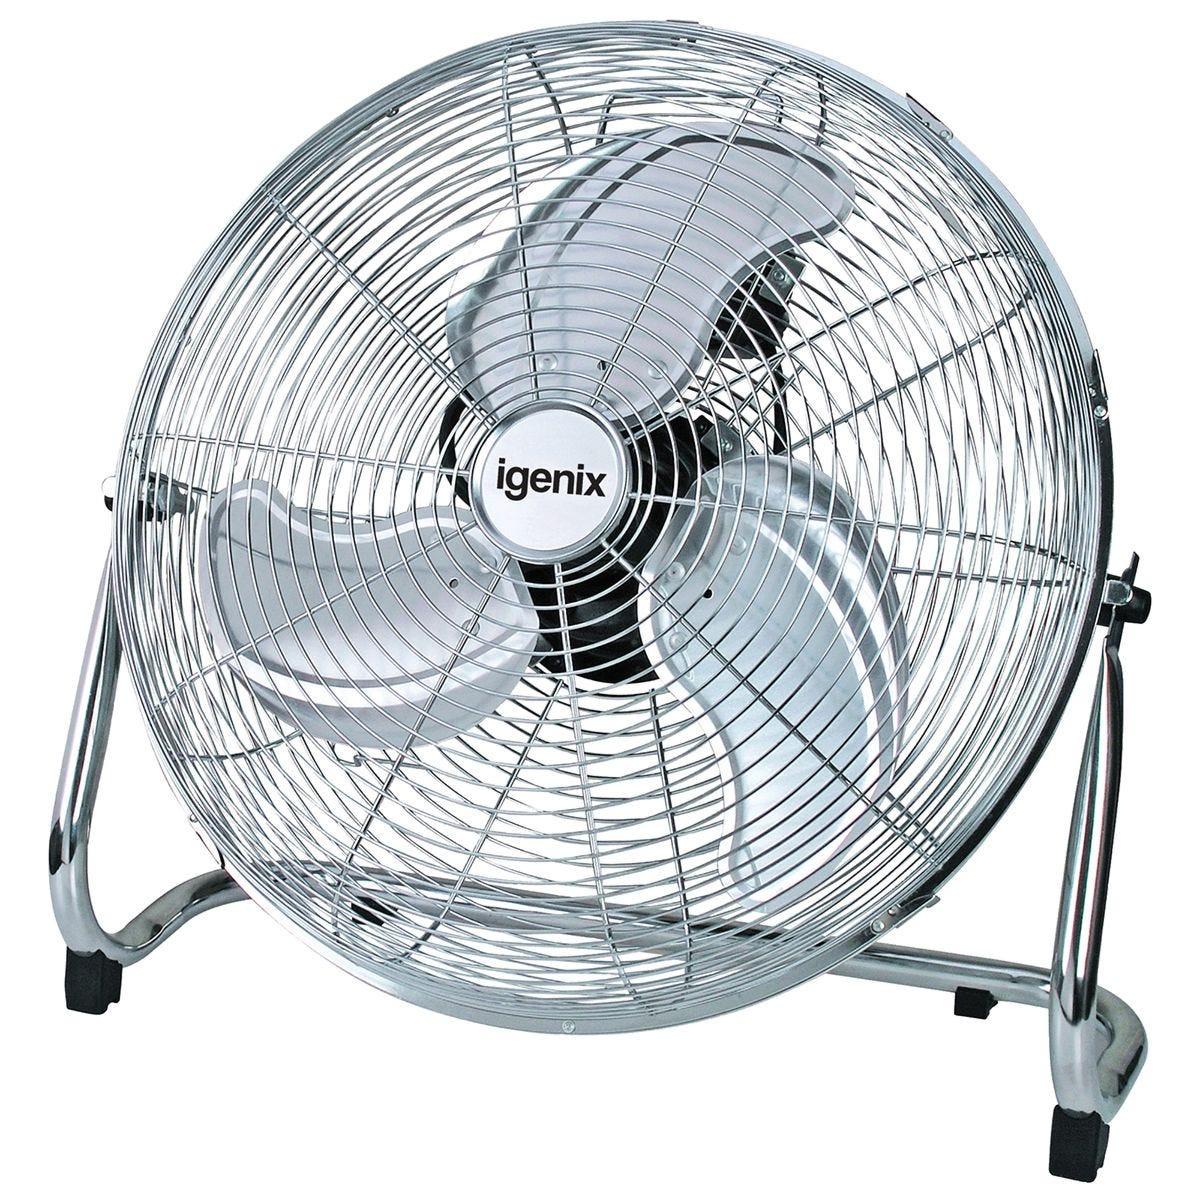 Igenix 18 Inch Floorstanding Air Circulator Fan - Chrome